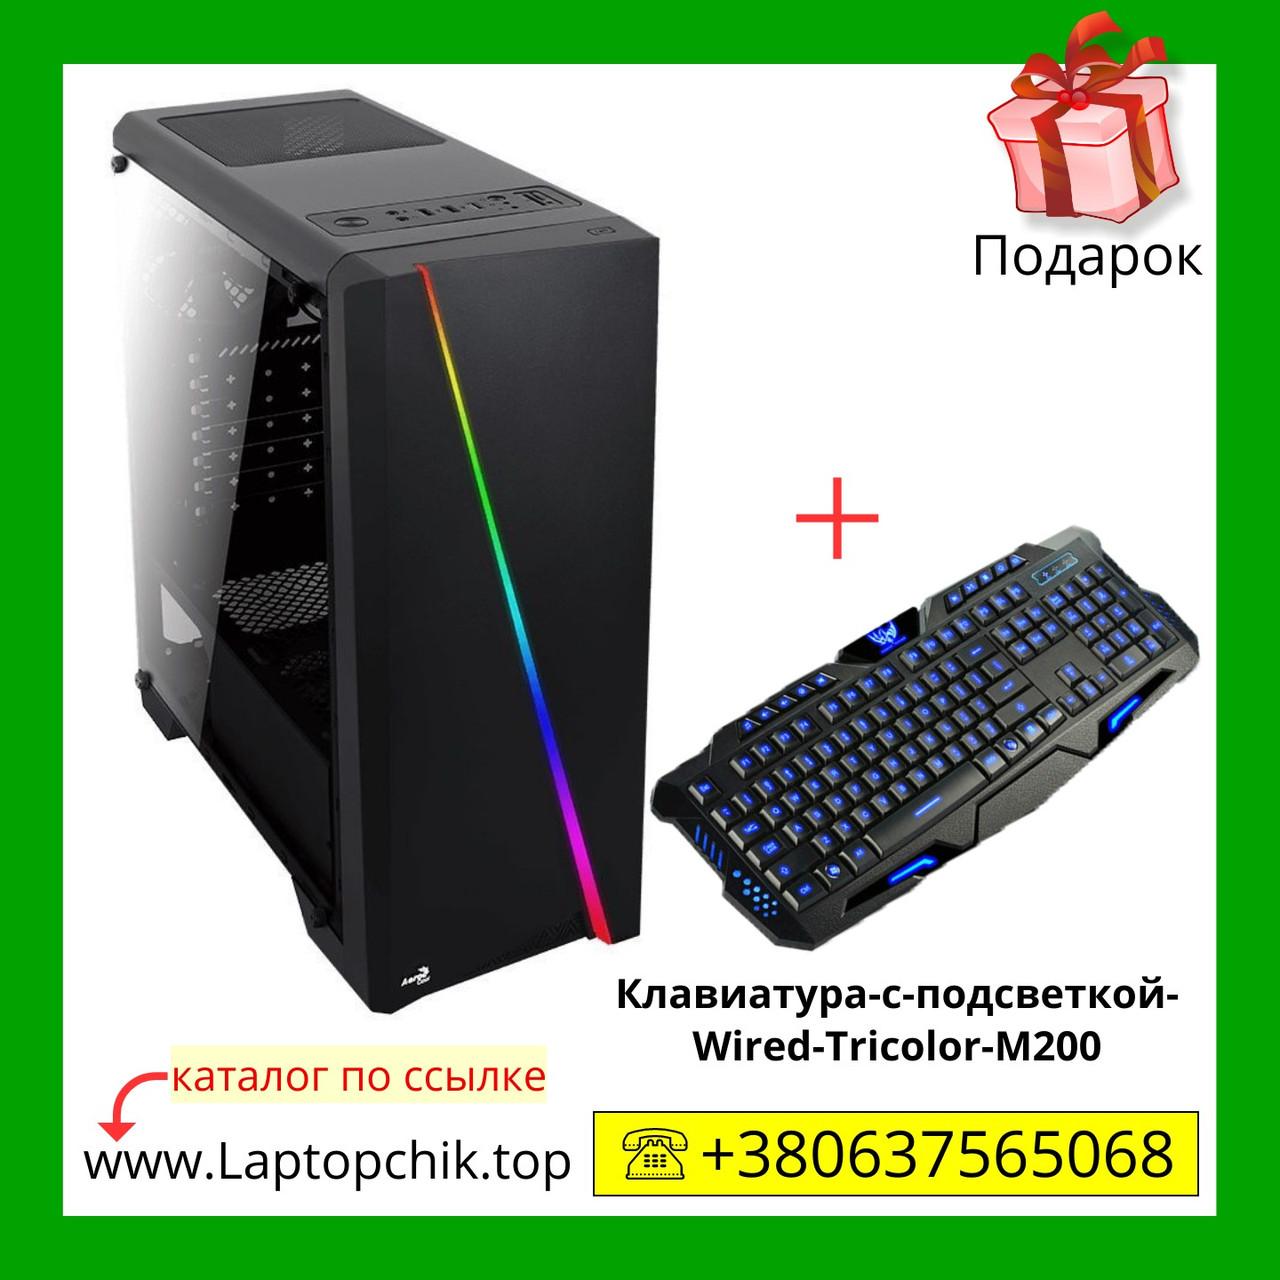 Игровой компьютер Intel Pentium G3250 / 8 RAM / 320 HDD / Radeon RX 550 4GB